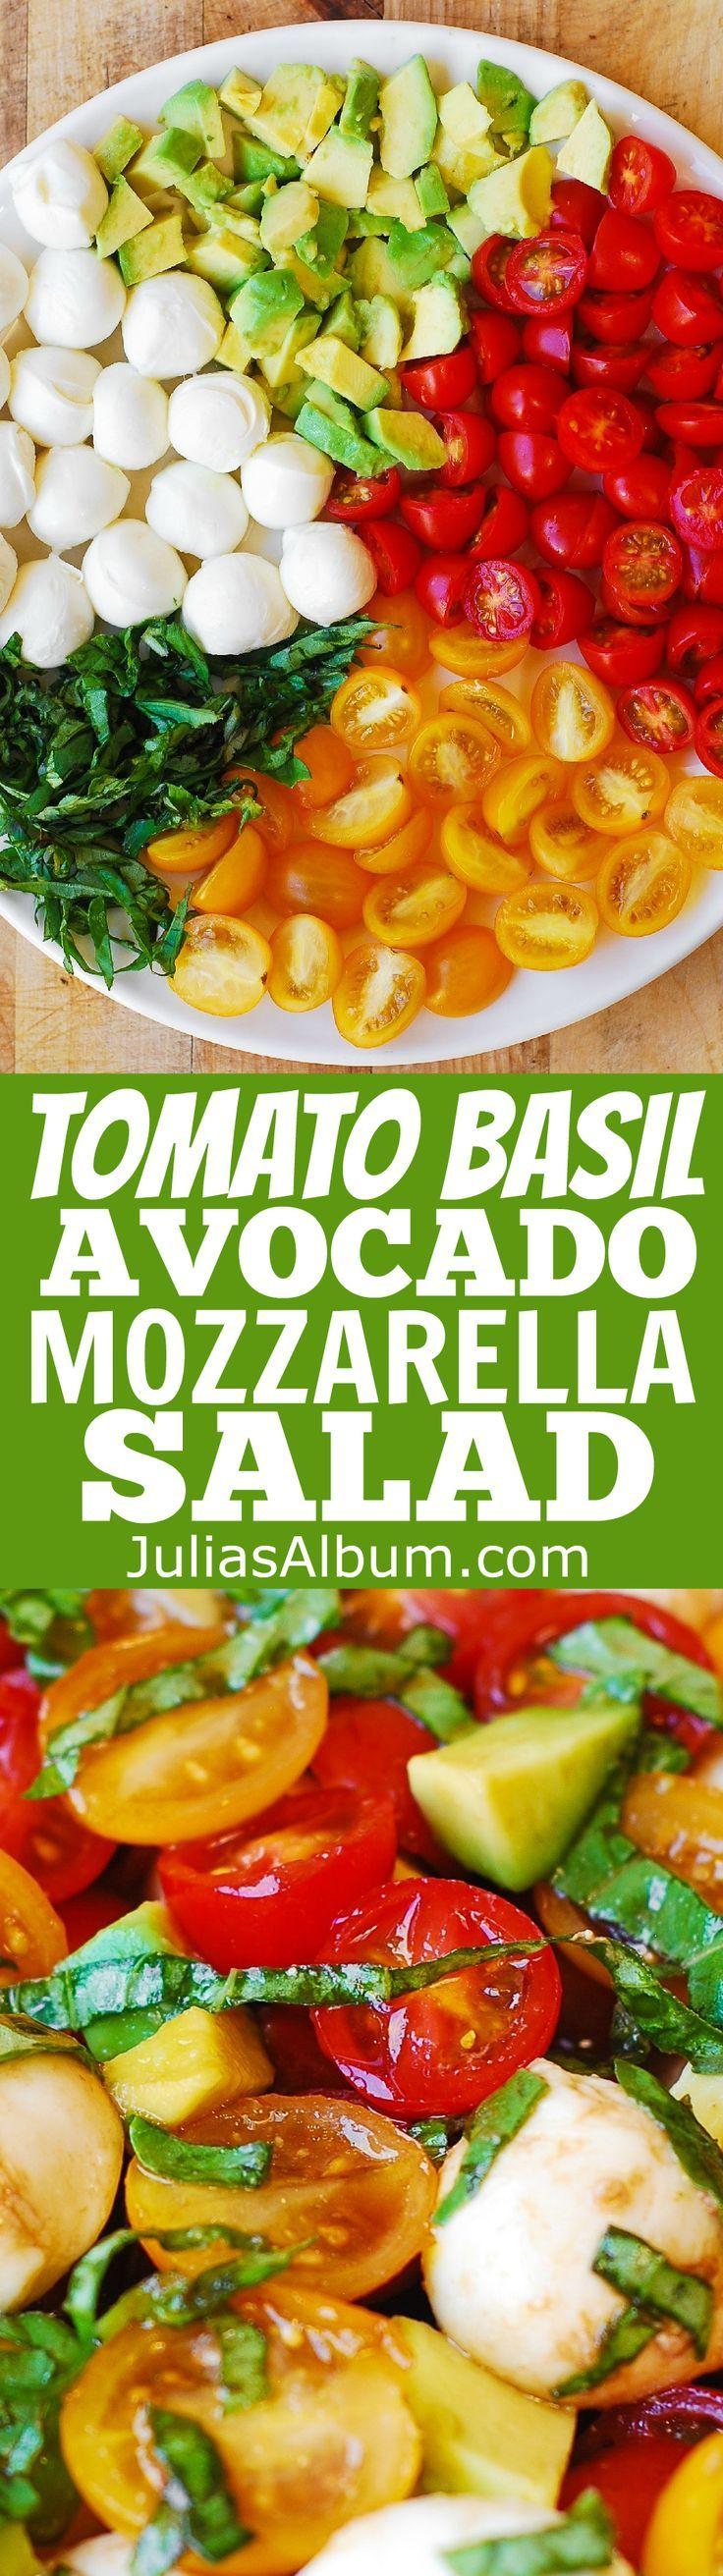 Tomato Basil Avocado Mozzarella Salad with Balsamic Dressing - #Mediterranean…